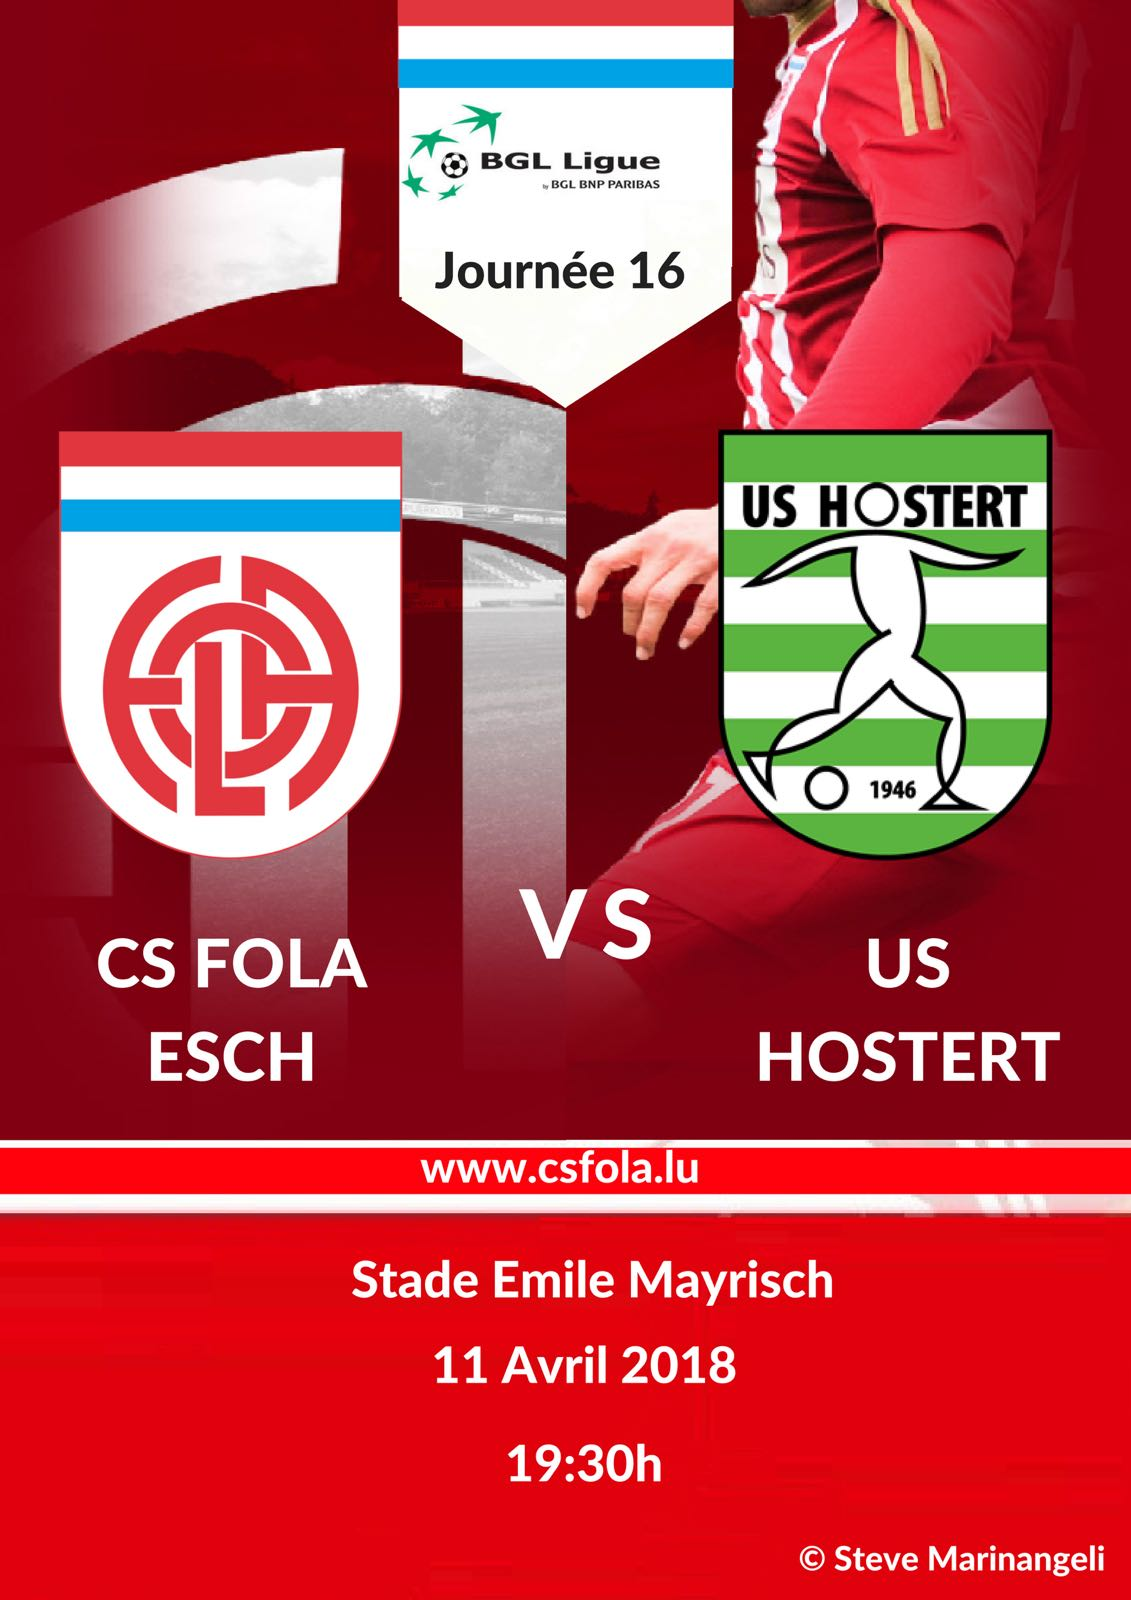 CS FOLA vs US HOSTERT